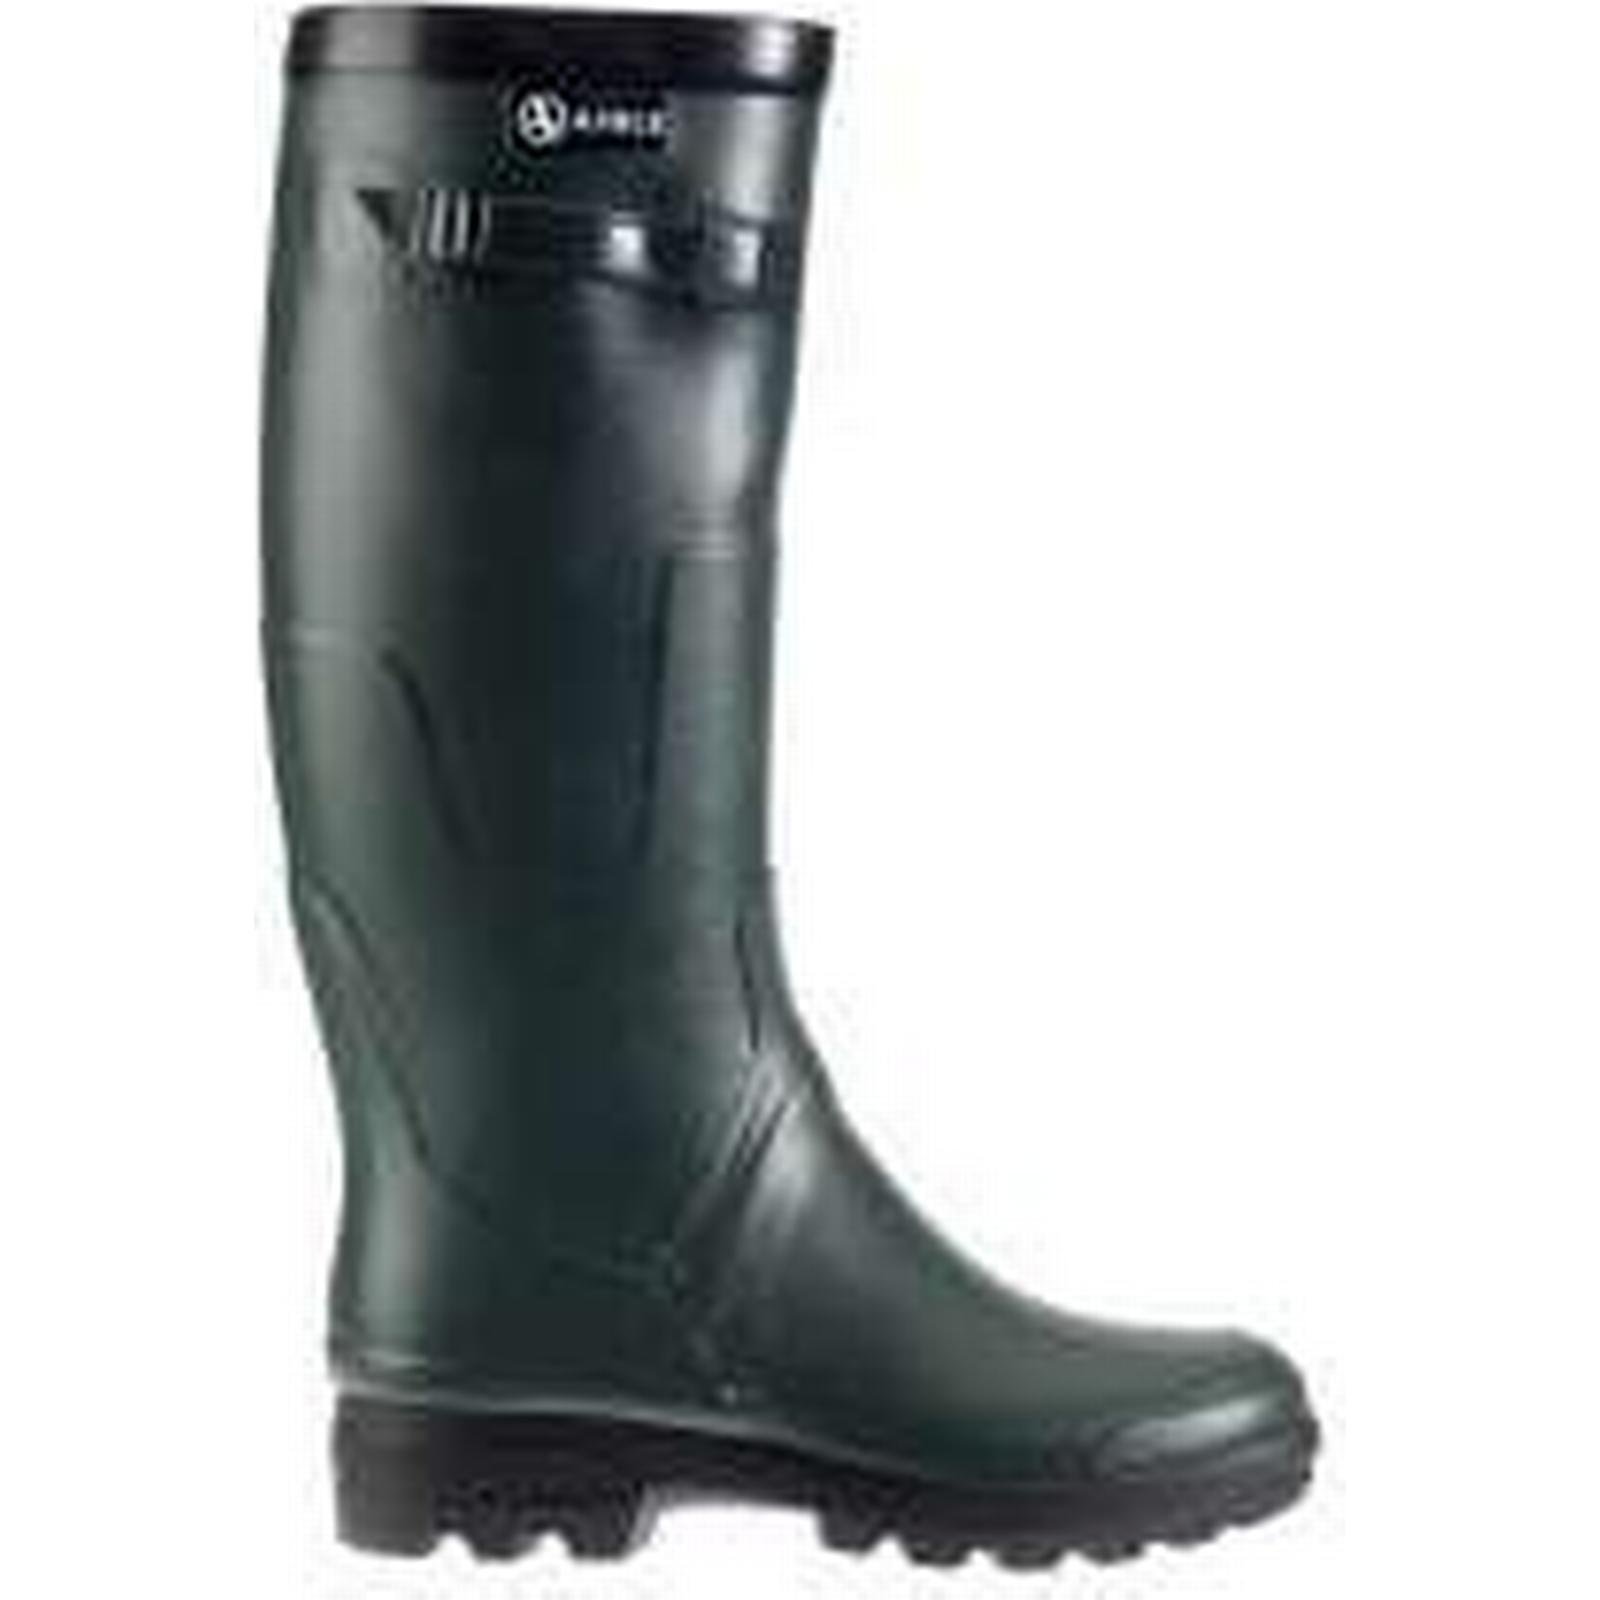 Aigle Benyl Benyl Benyl Boot, Green, EU37 88541c